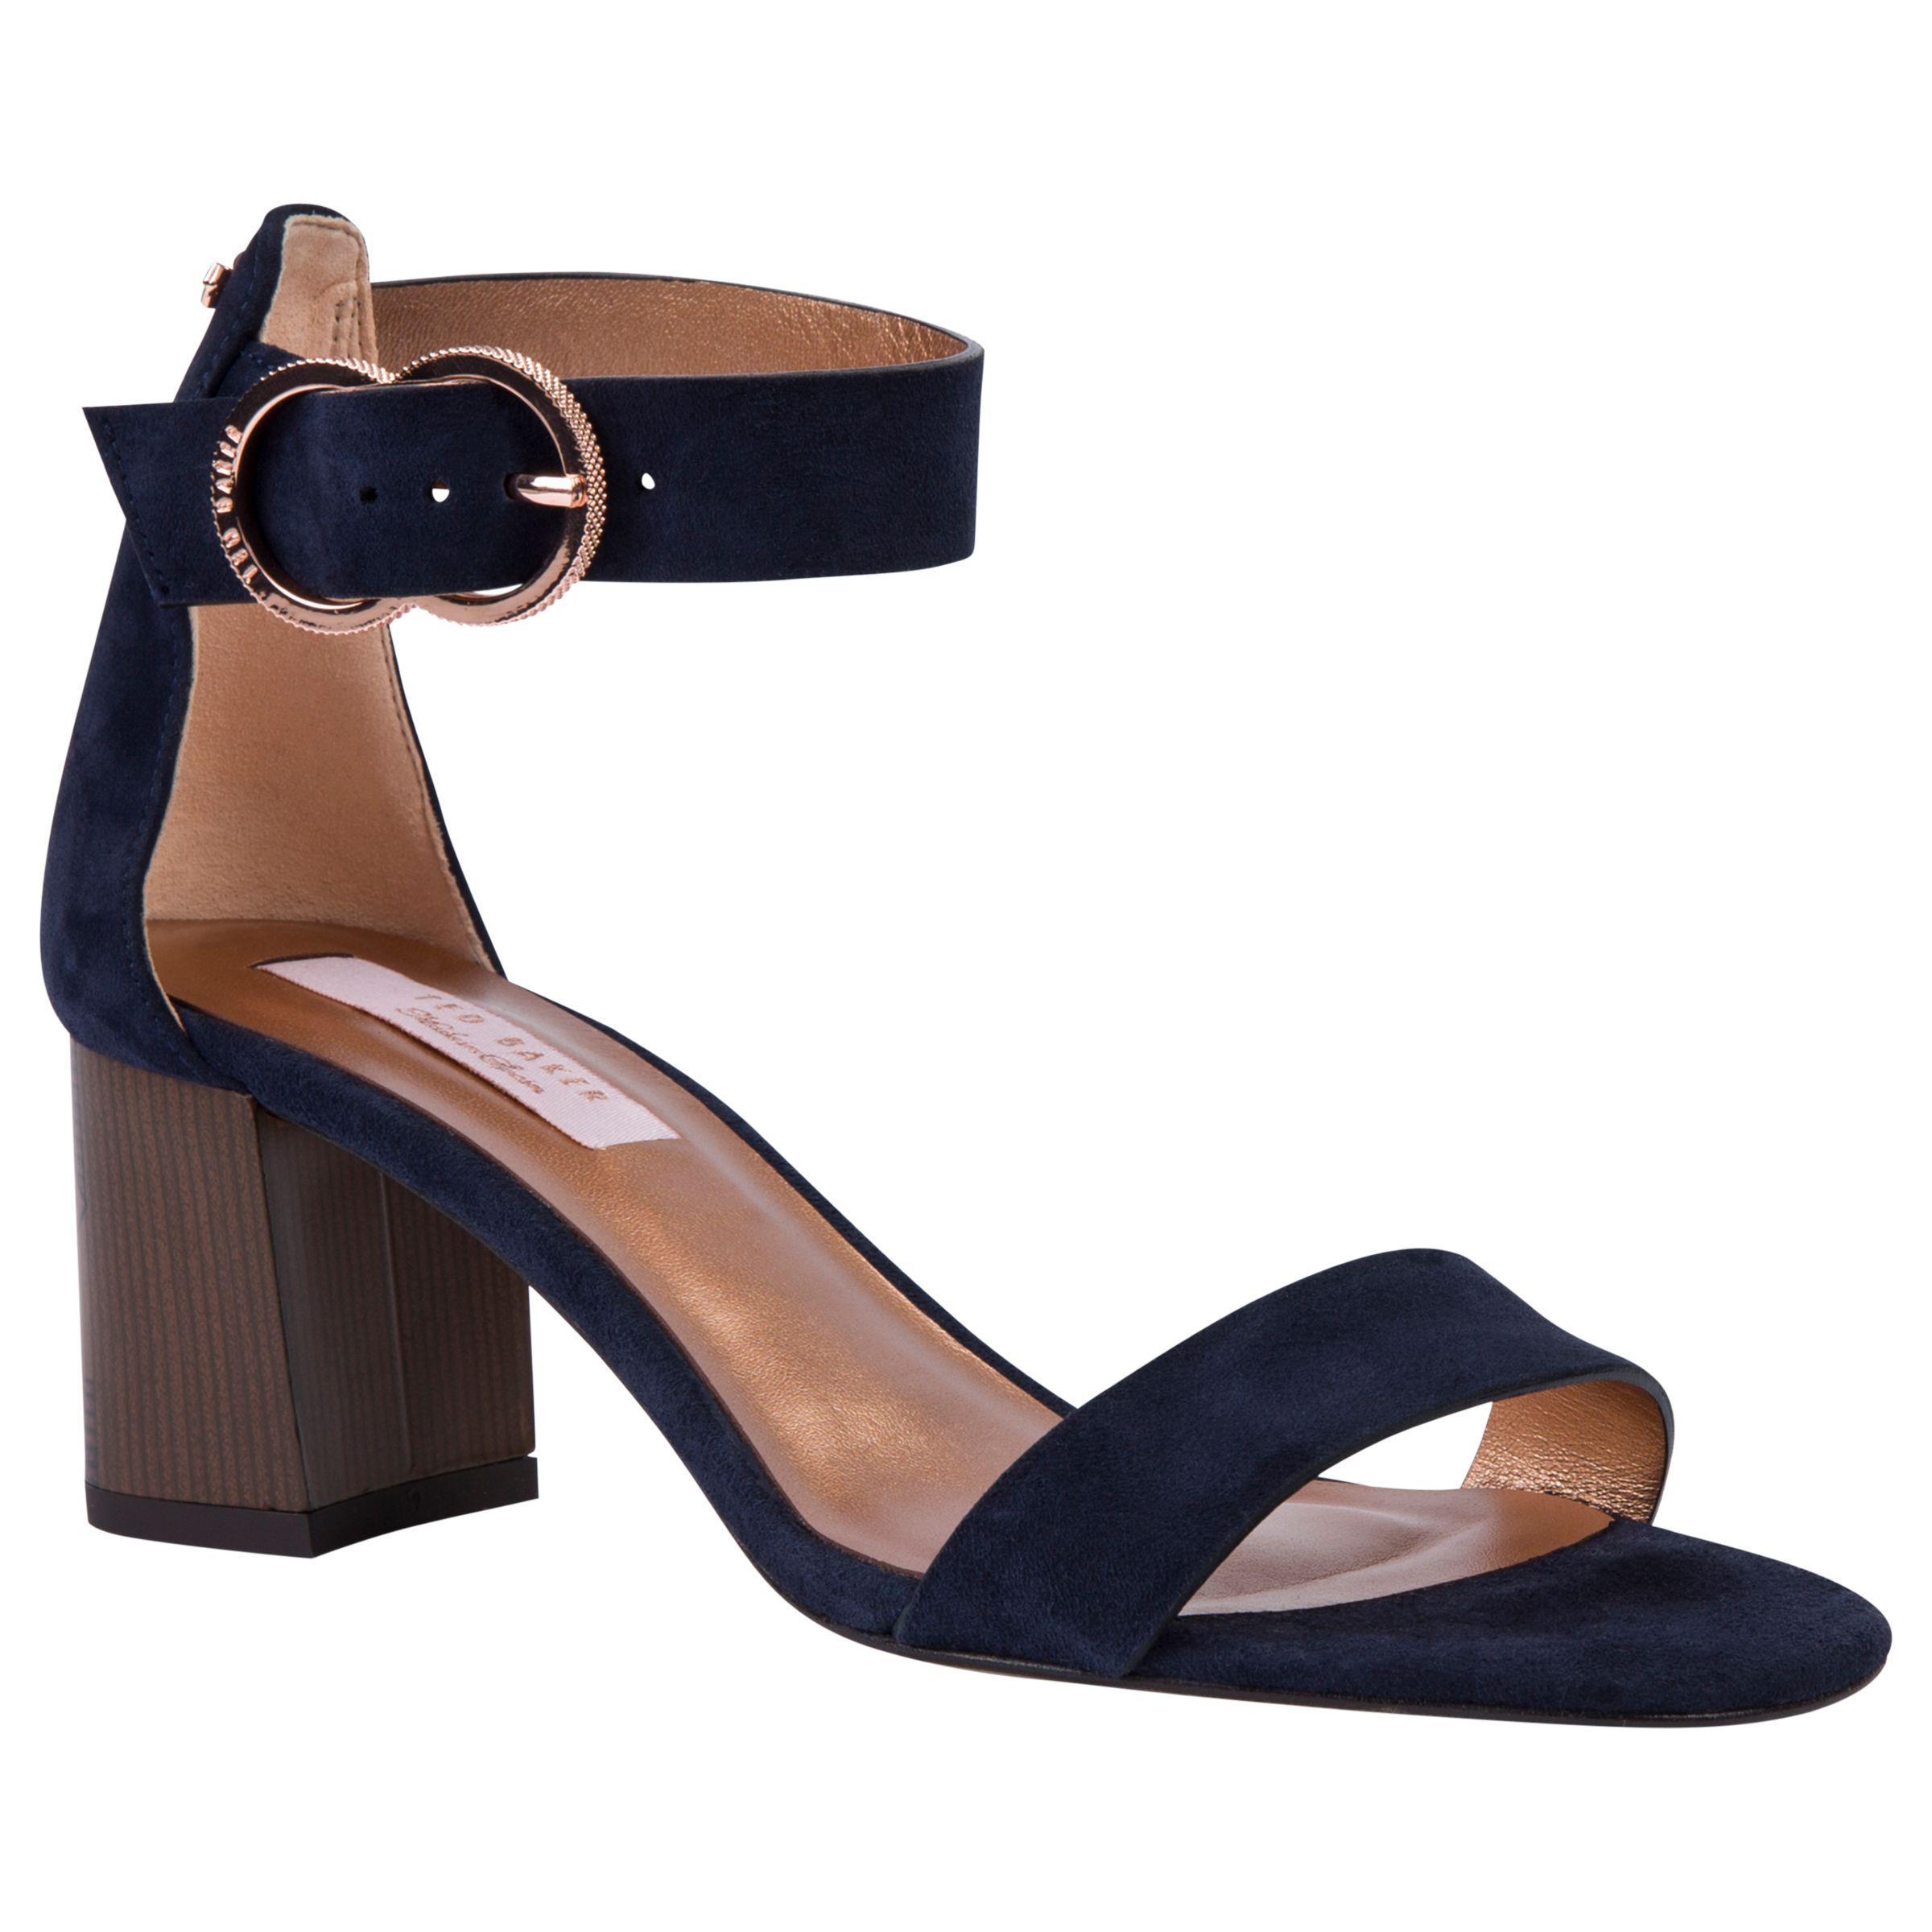 32b3c0dd13426a Ted Baker Qarvas Block Heel Sandals in Blue - Lyst